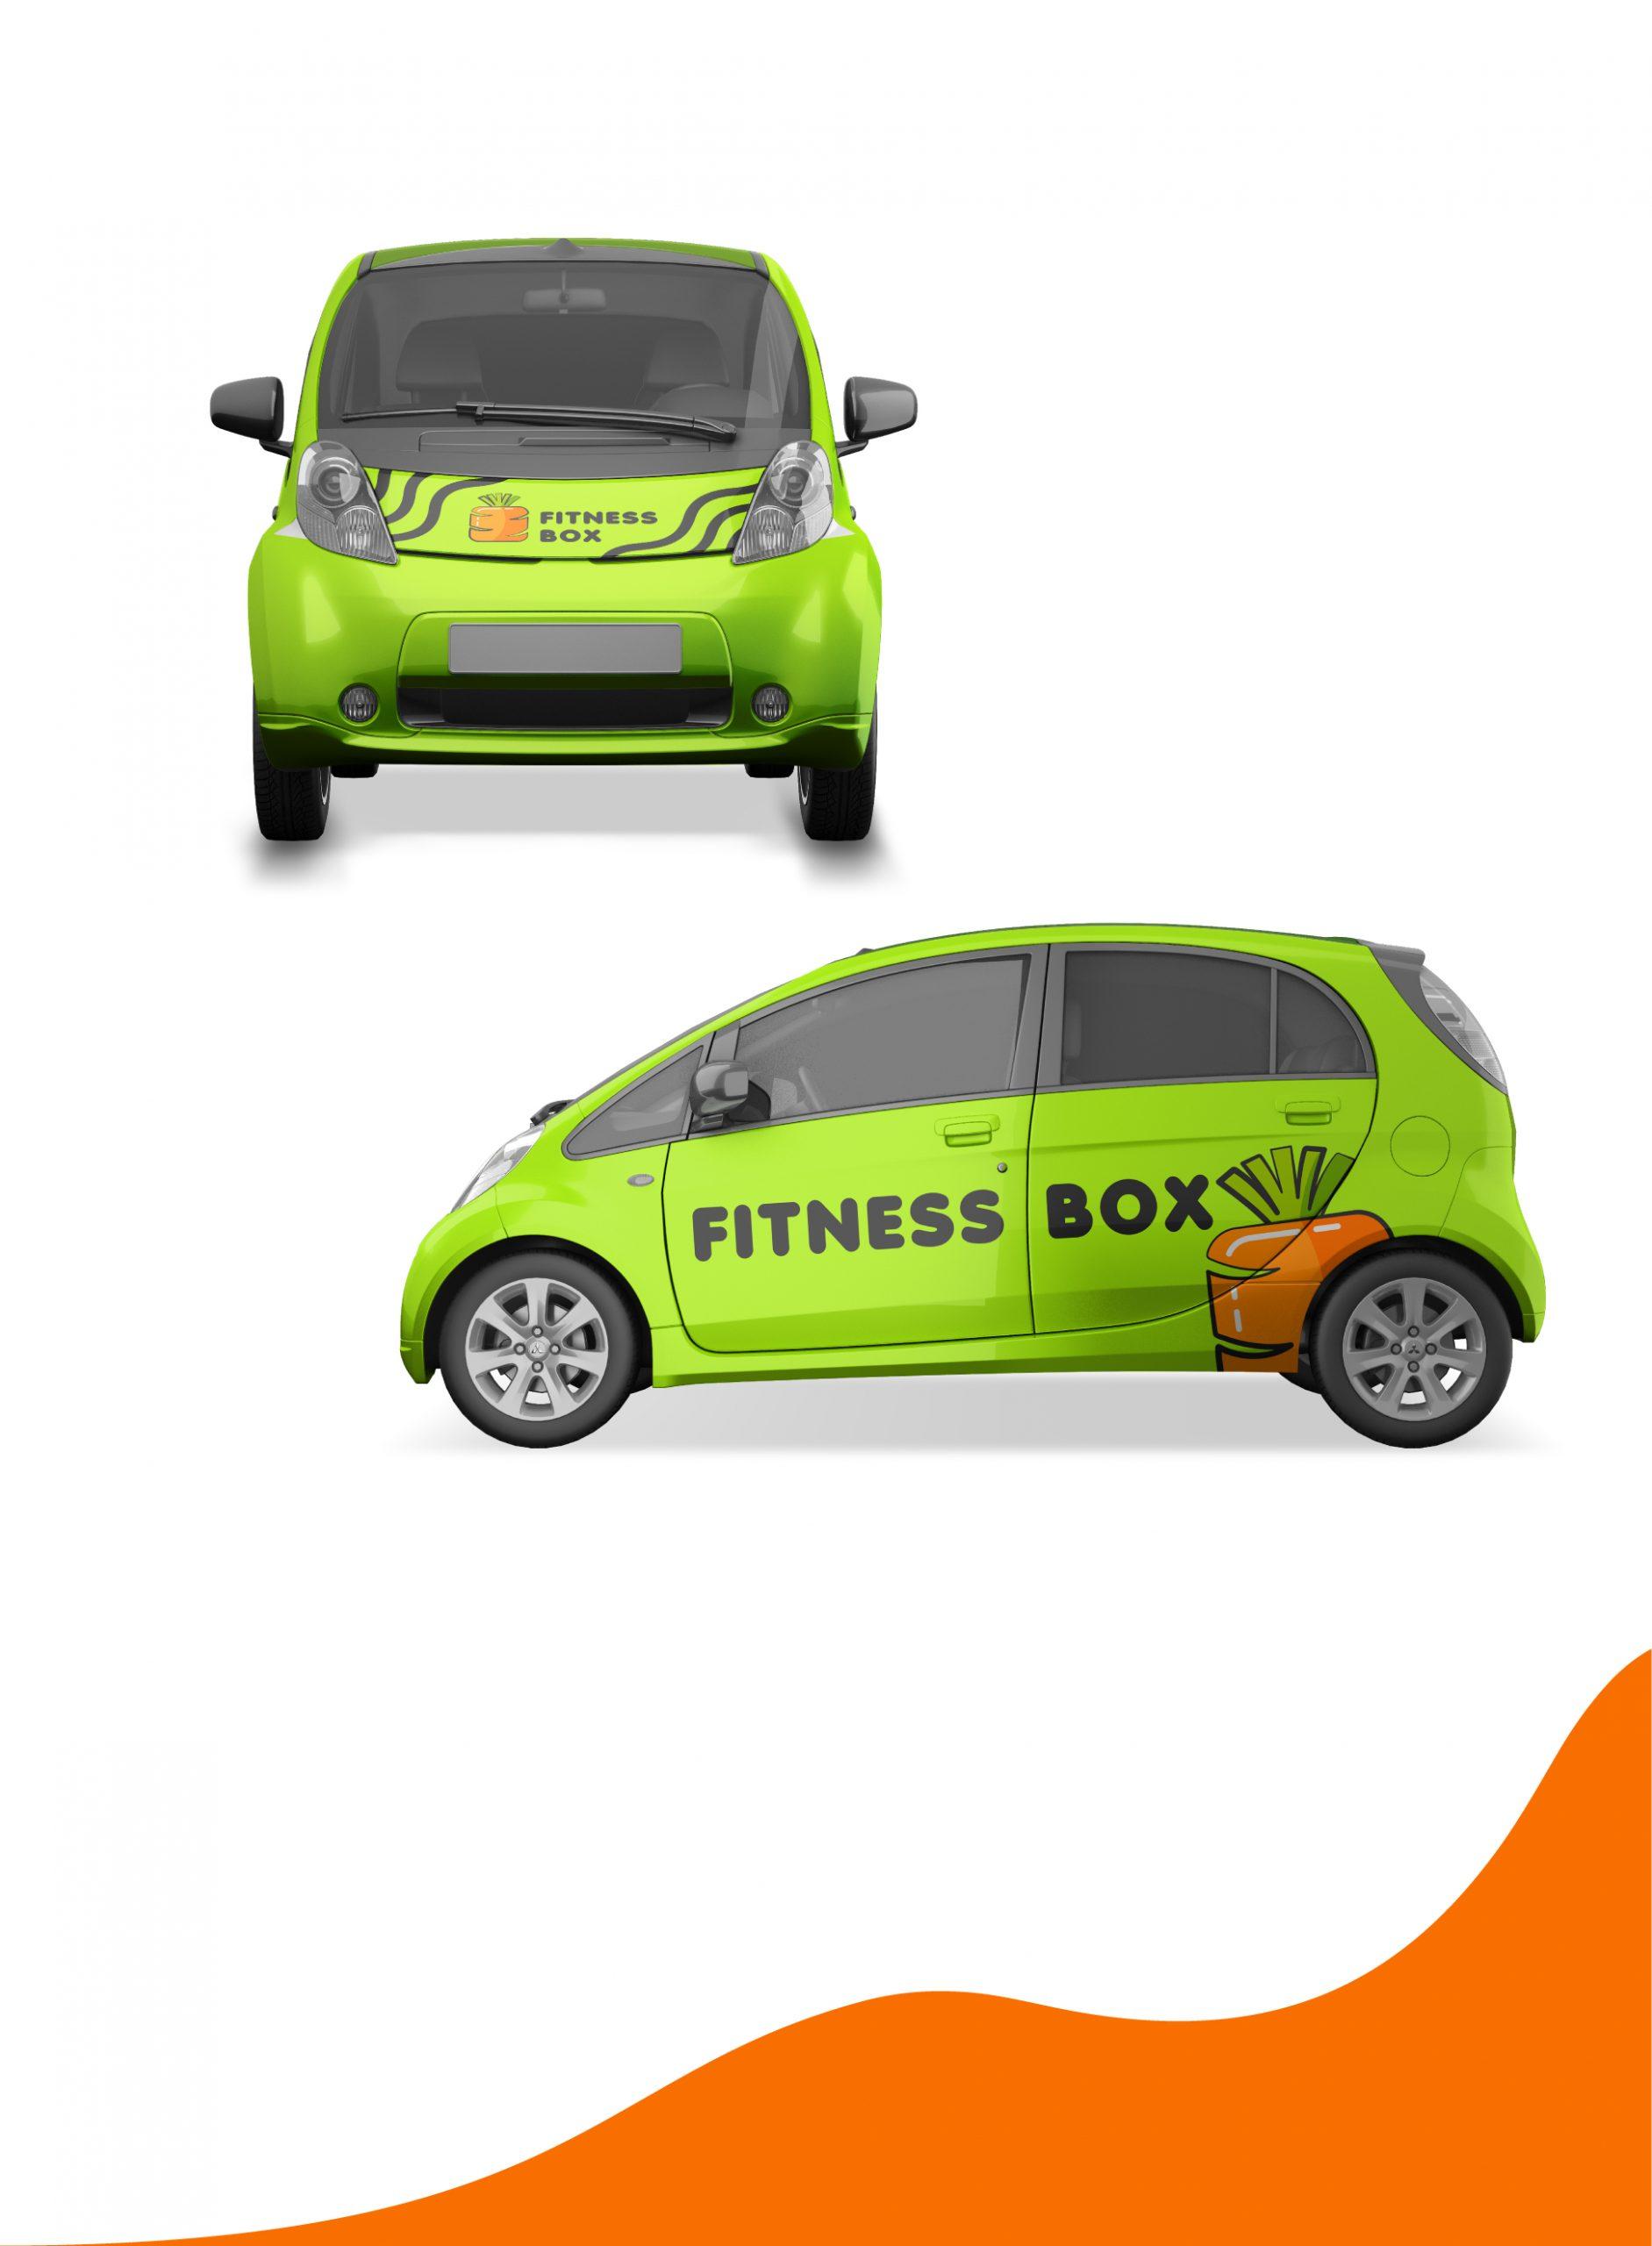 fitness box 6